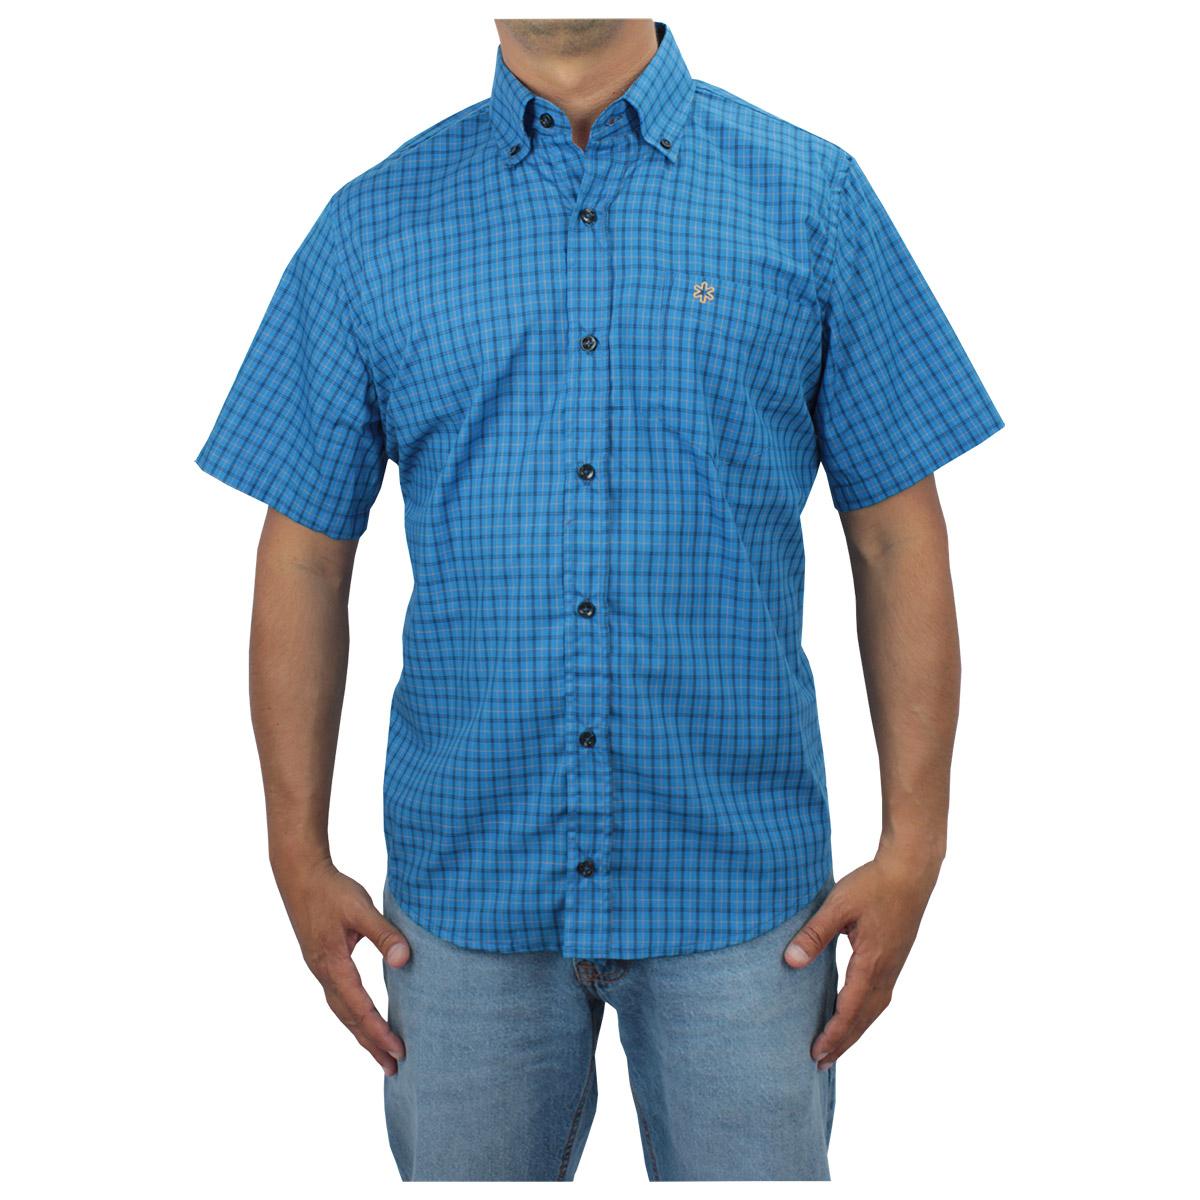 Camisa Tuff Masculina Manga Curta Xadrez Azul